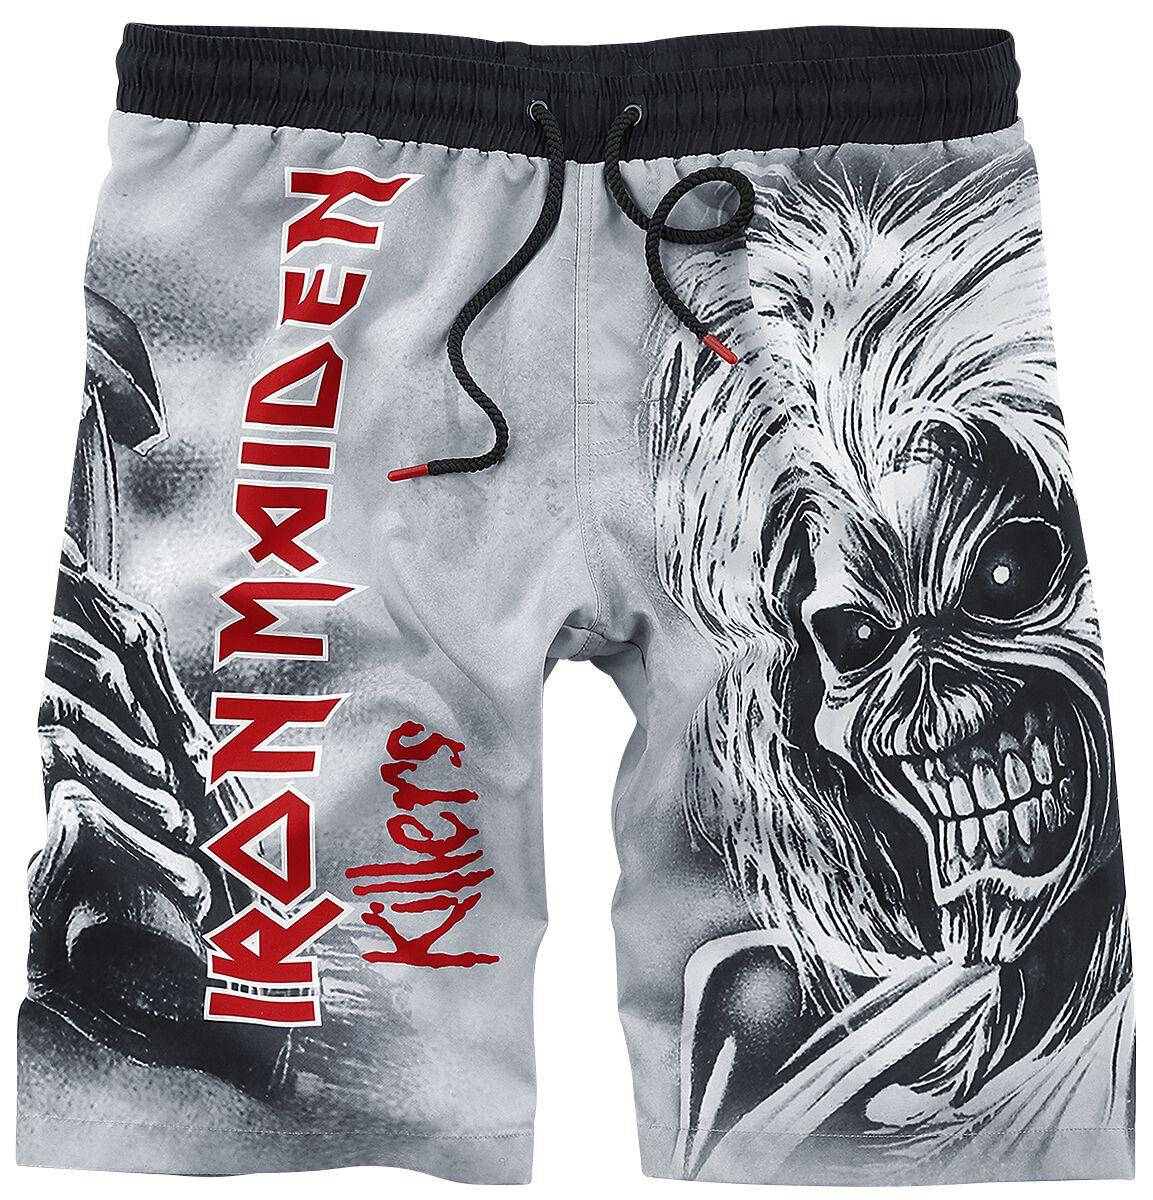 20482c8bd768b EMP Signature Collection | Iron Maiden Swim Shorts | EMP